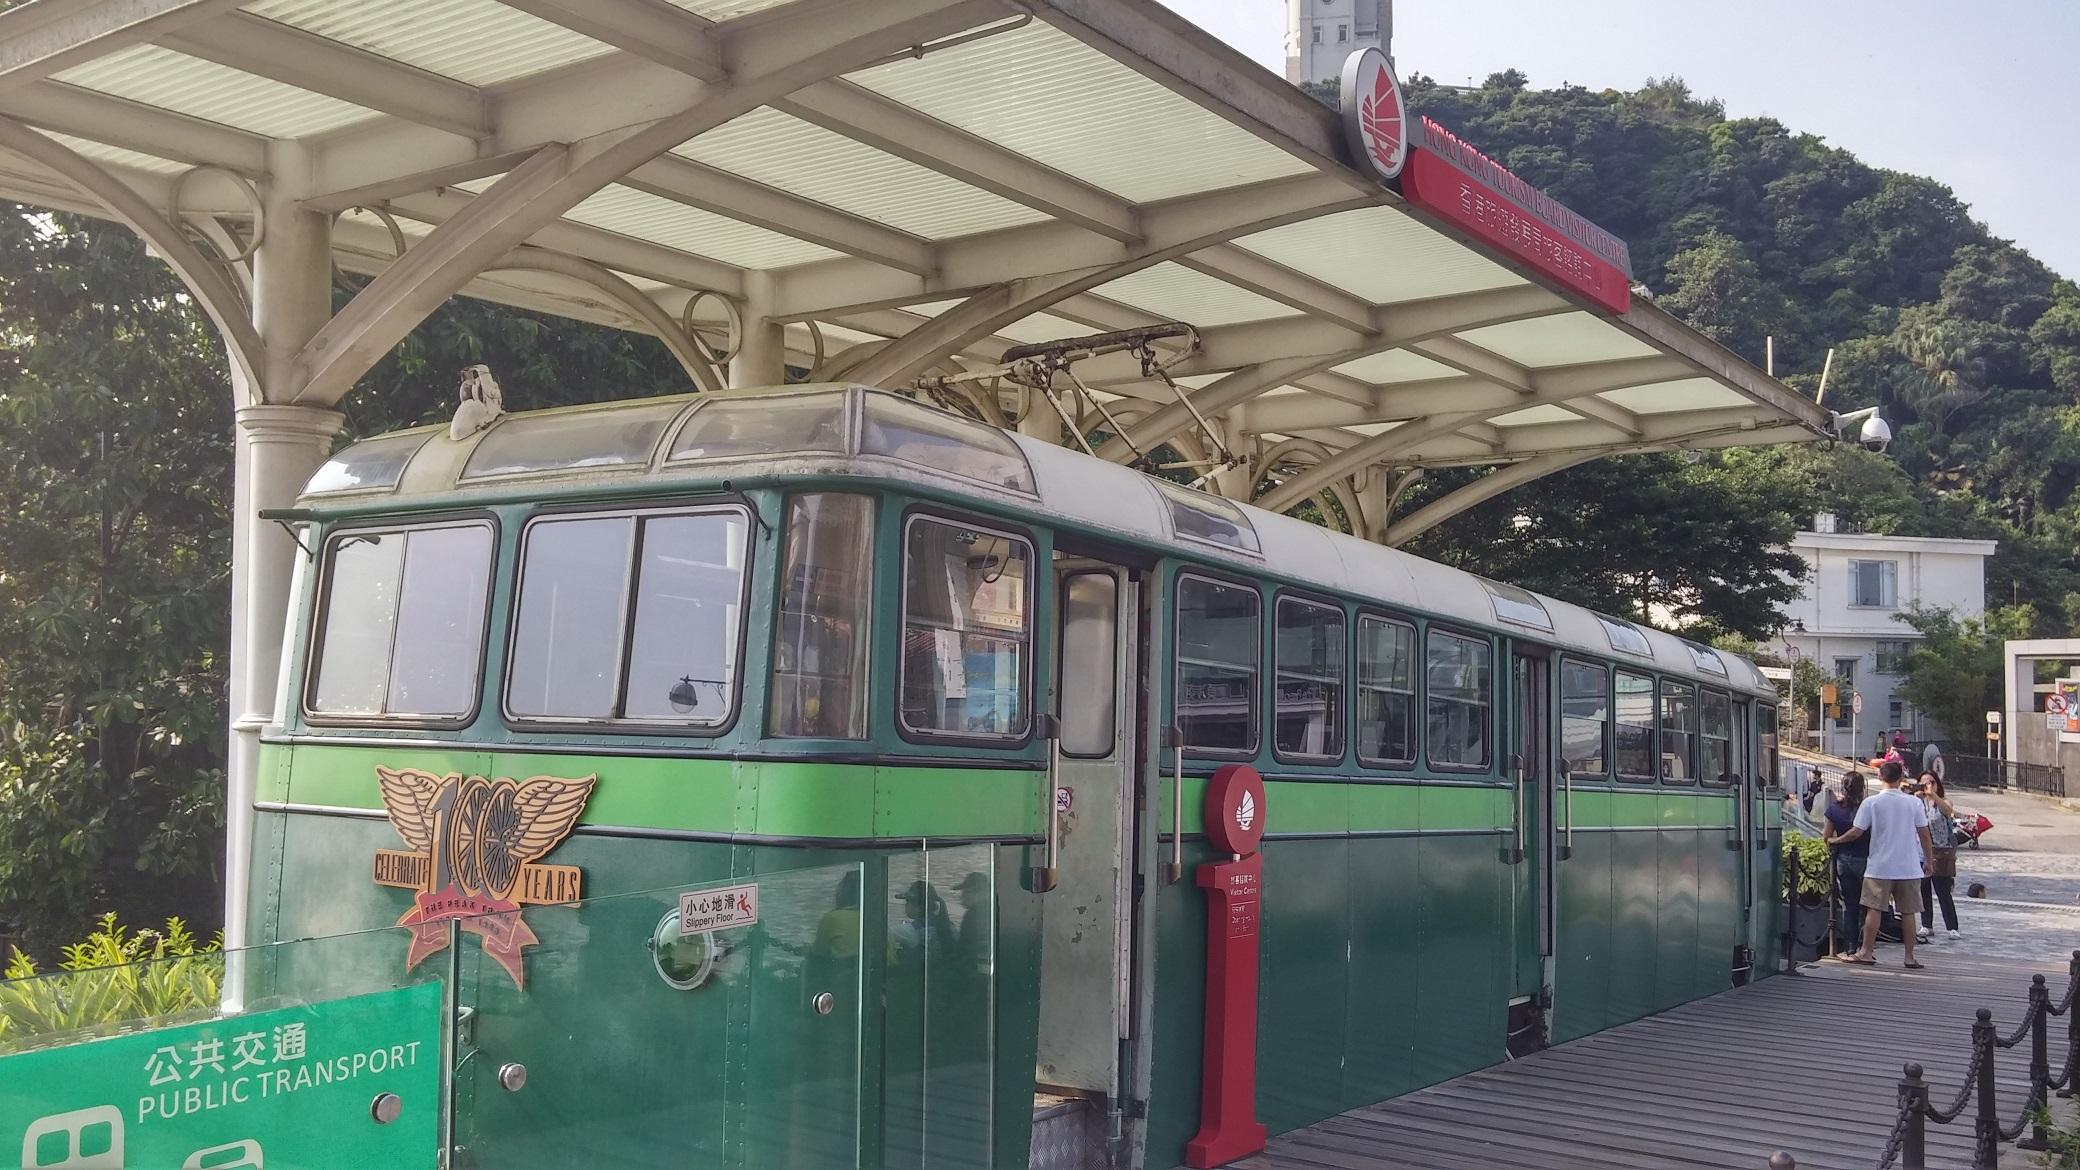 Victoria Peak Hong Kong Tourism Board customer service center is a retired Peak Tram